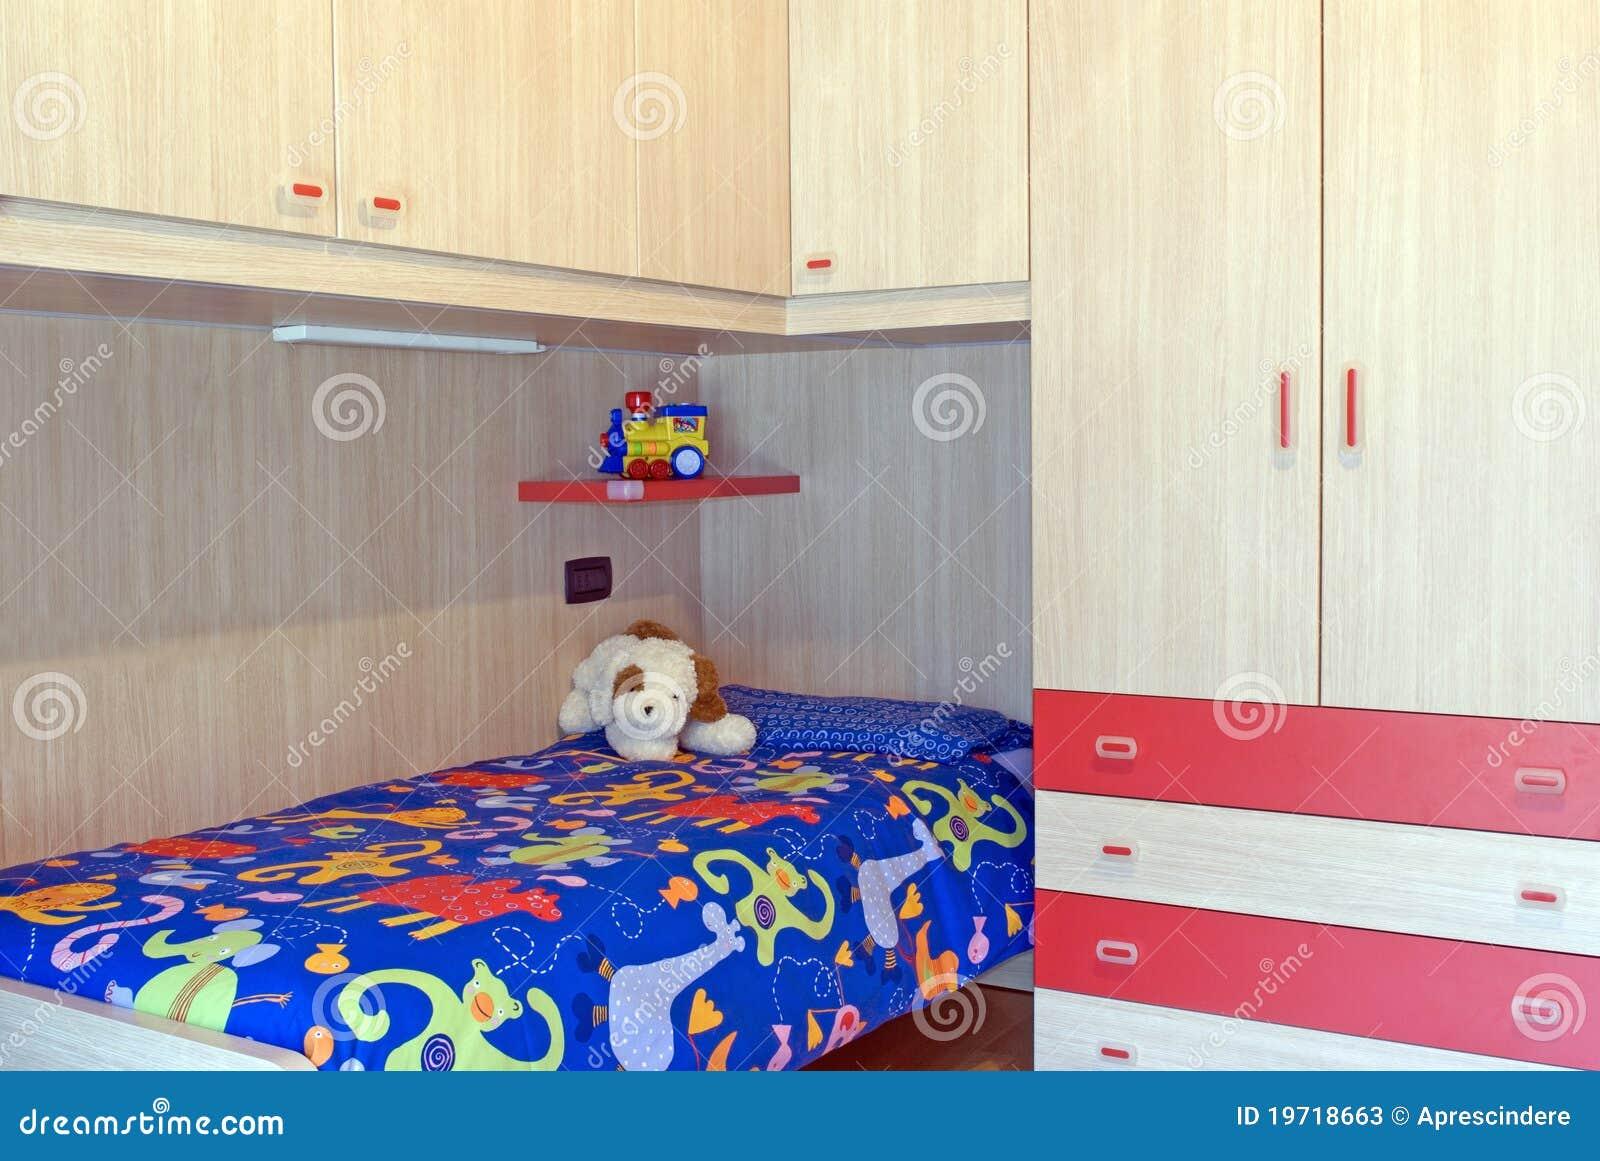 Children Bedroom Stock Image Image Of Youth Child Children 19718663